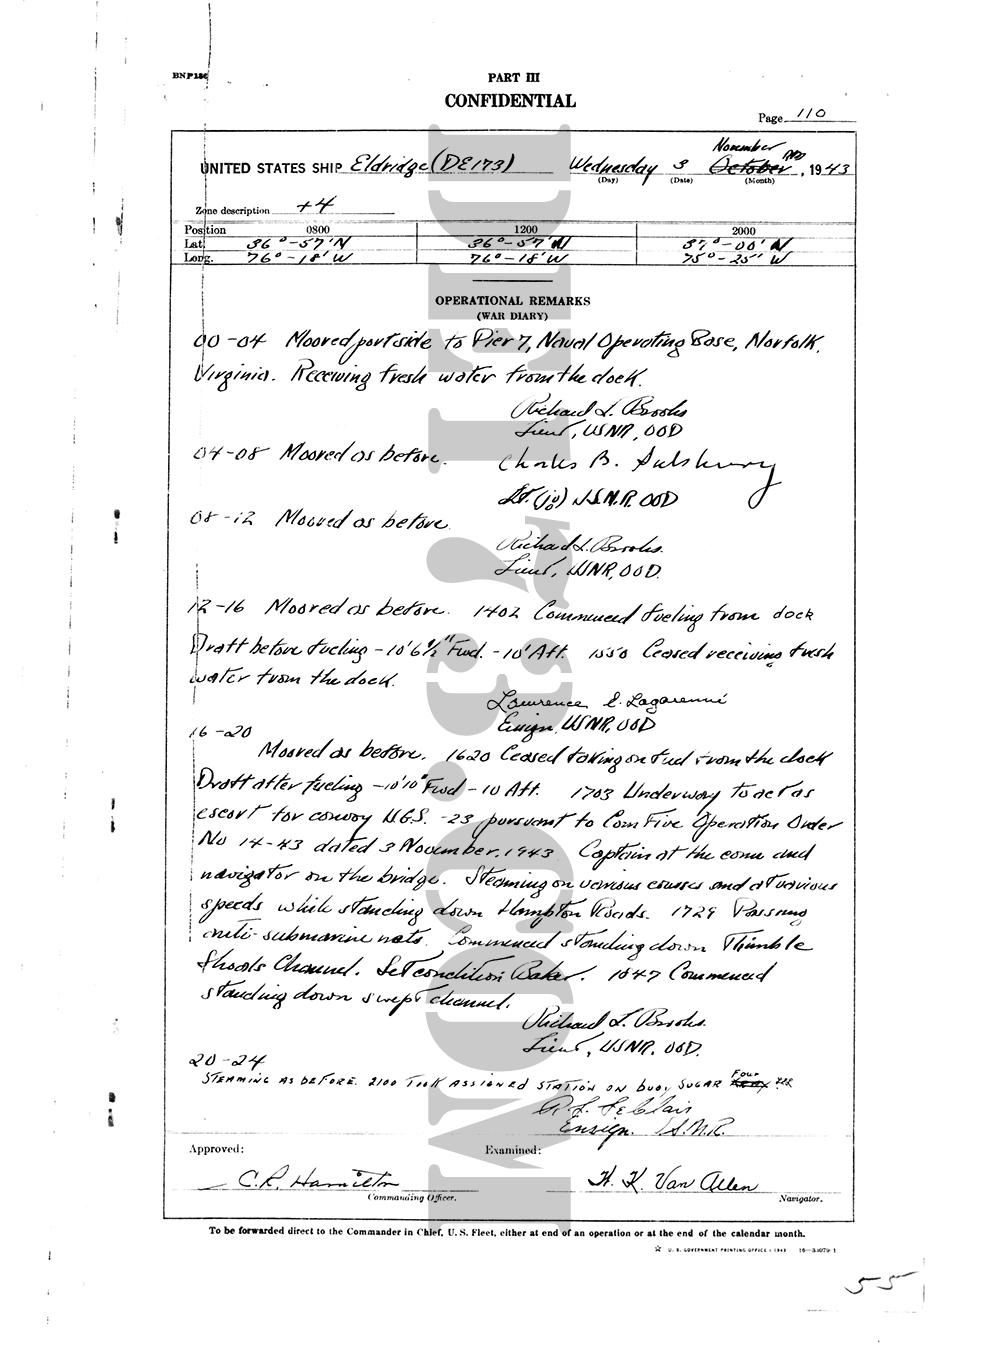 USS Eldridge Microfilm Page 110 / November 3th, 1943